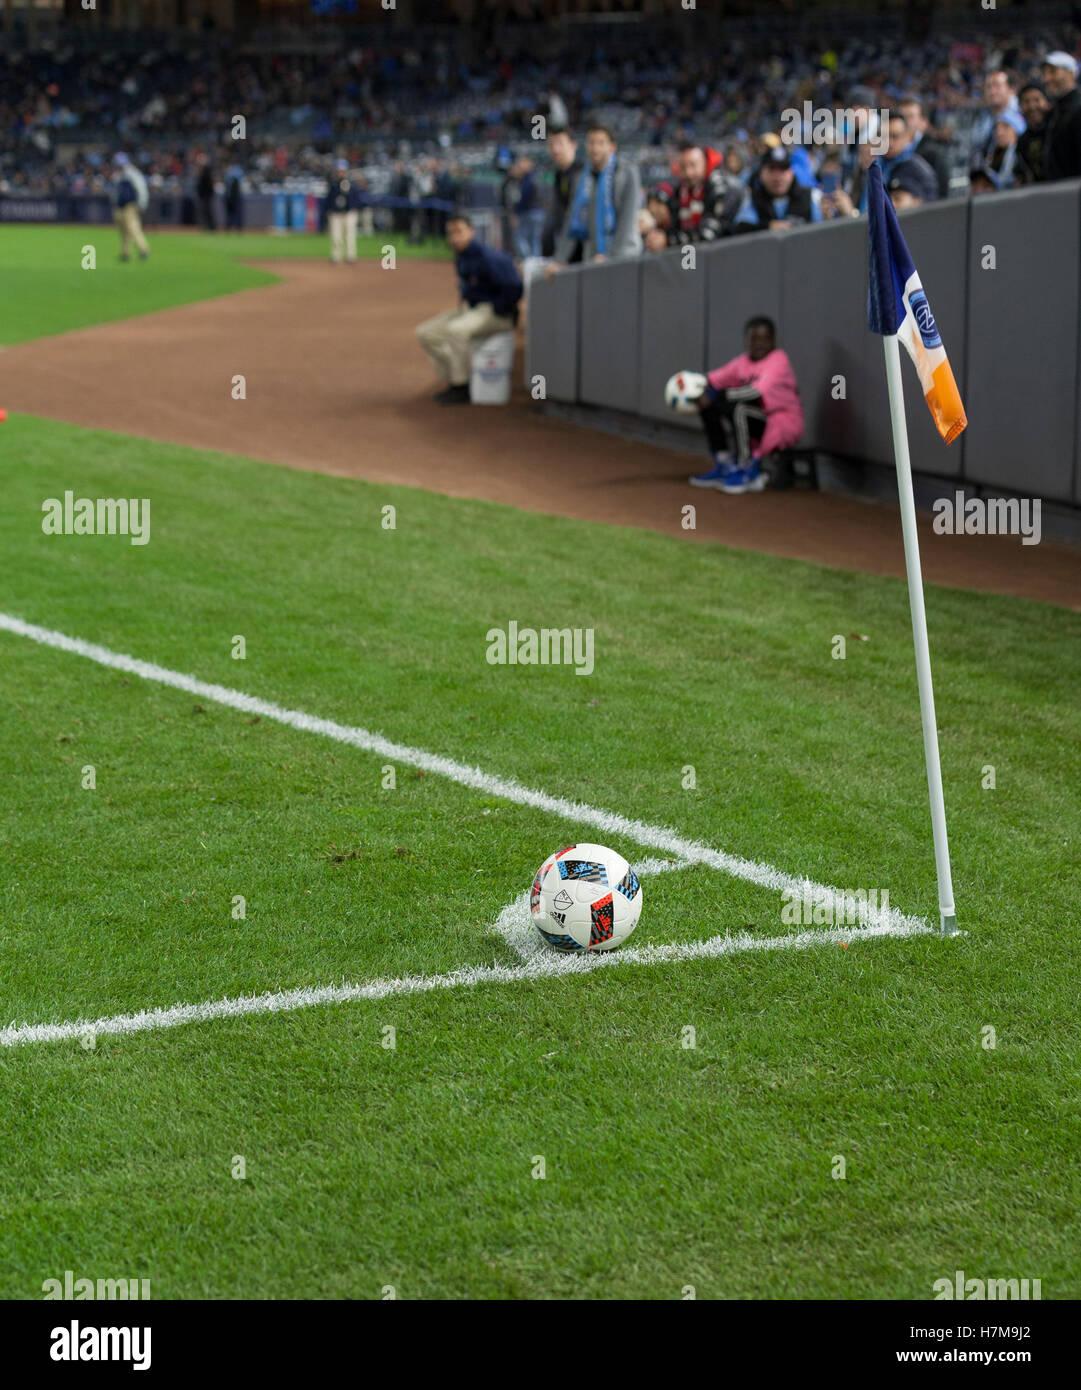 New York, Vereinigte Staaten von Amerika. 6. November 2016. New York, NY USA - 6. November 2016: Fußball an Ecke Stockfoto